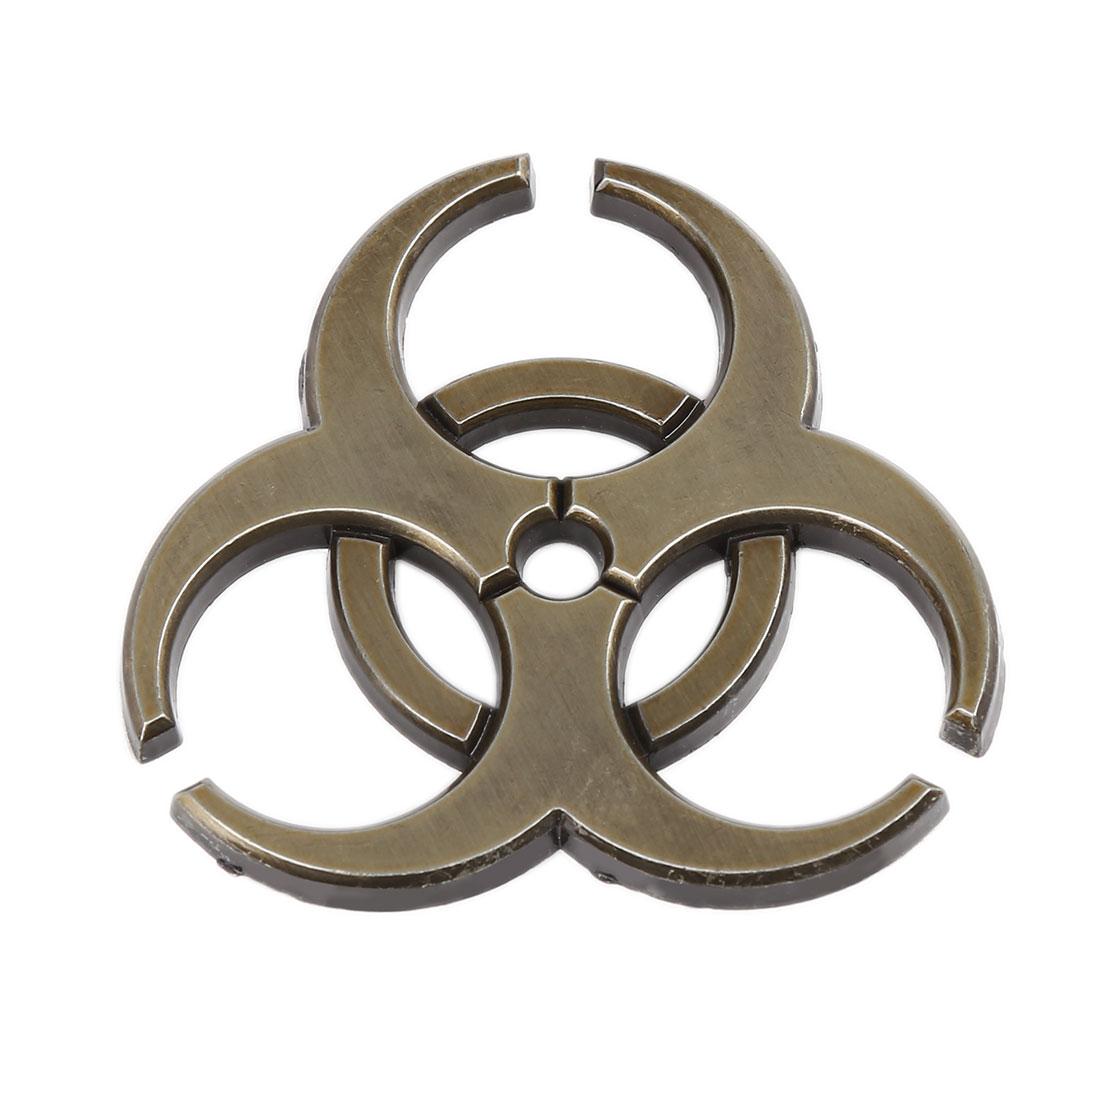 Bronze Tone Self Adhesive Car Body Metal Decorative Emblem Badge Decal Sticker